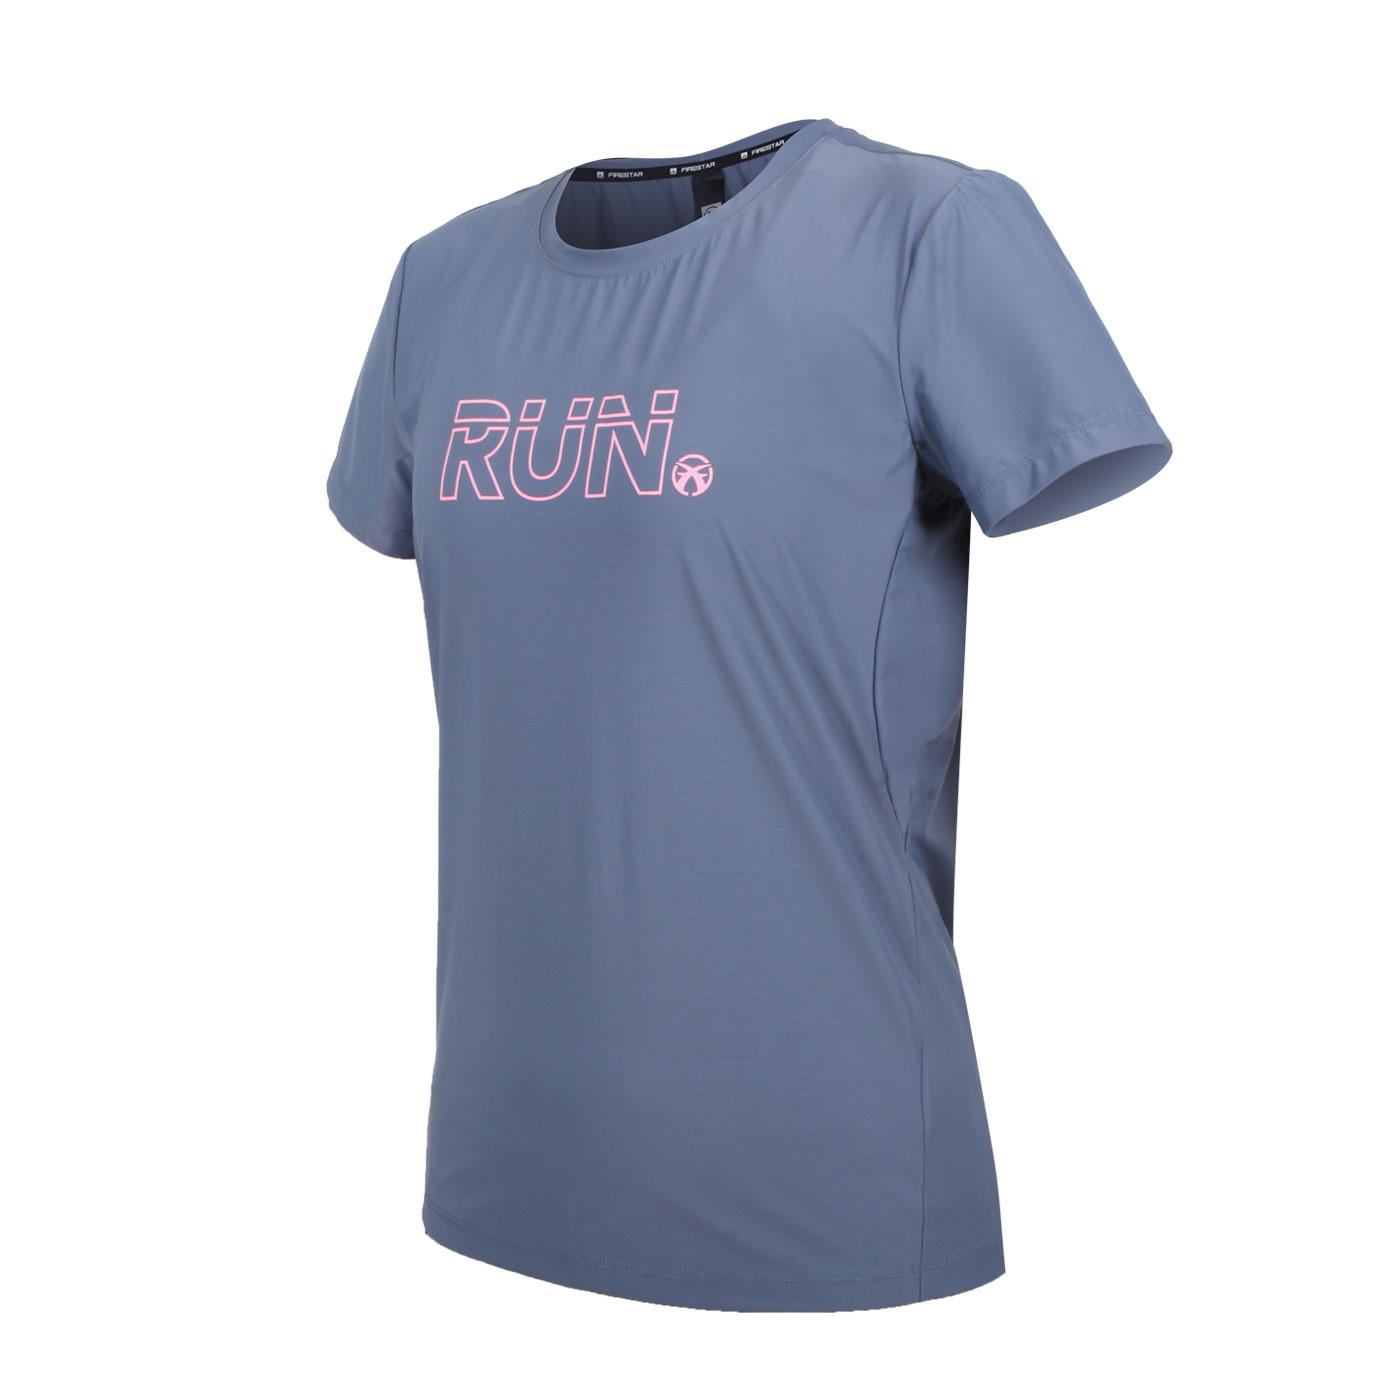 FIRESTAR 女款彈性印花圓領短袖T恤 DL163-13